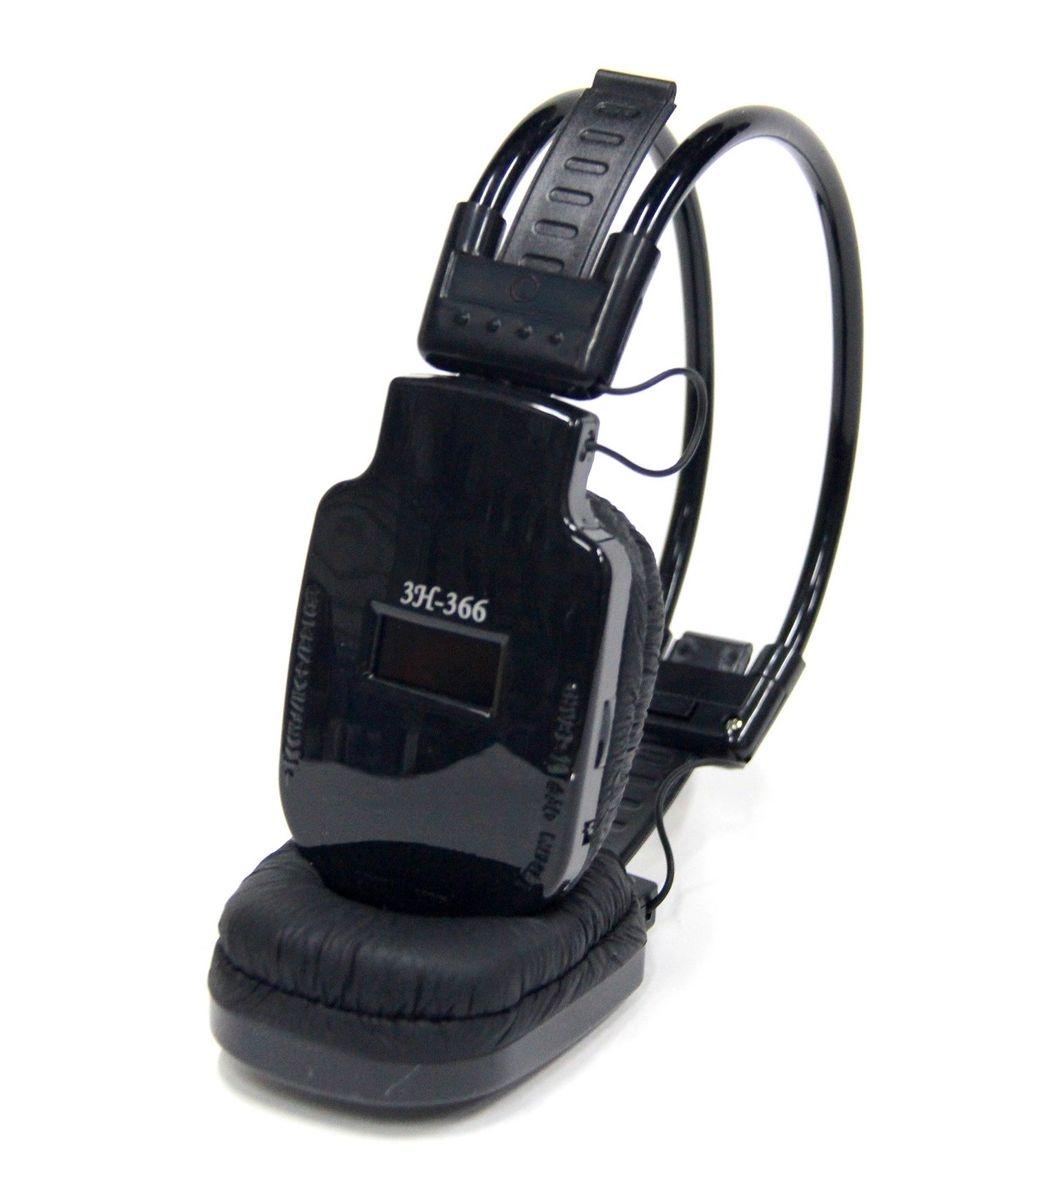 Наушники складные+Bluetooth+SD плеер+радио SH-366